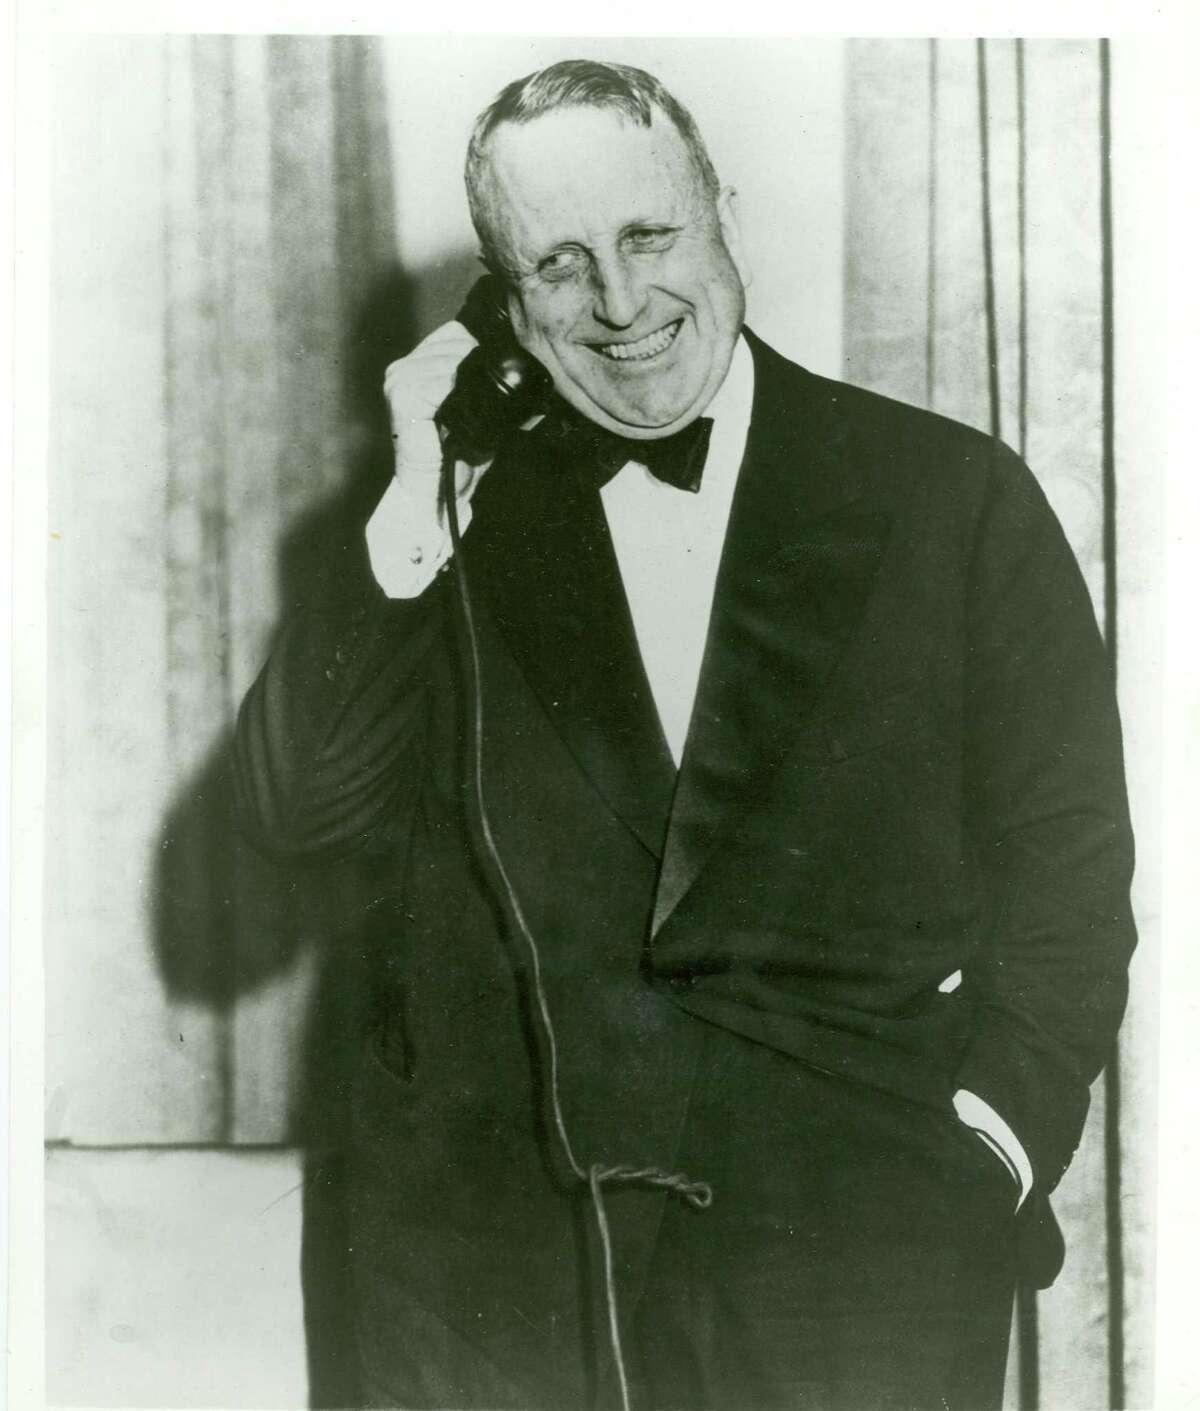 William Randolph Hearst (shown around 1930) was the inspiration for Orson Welles' film